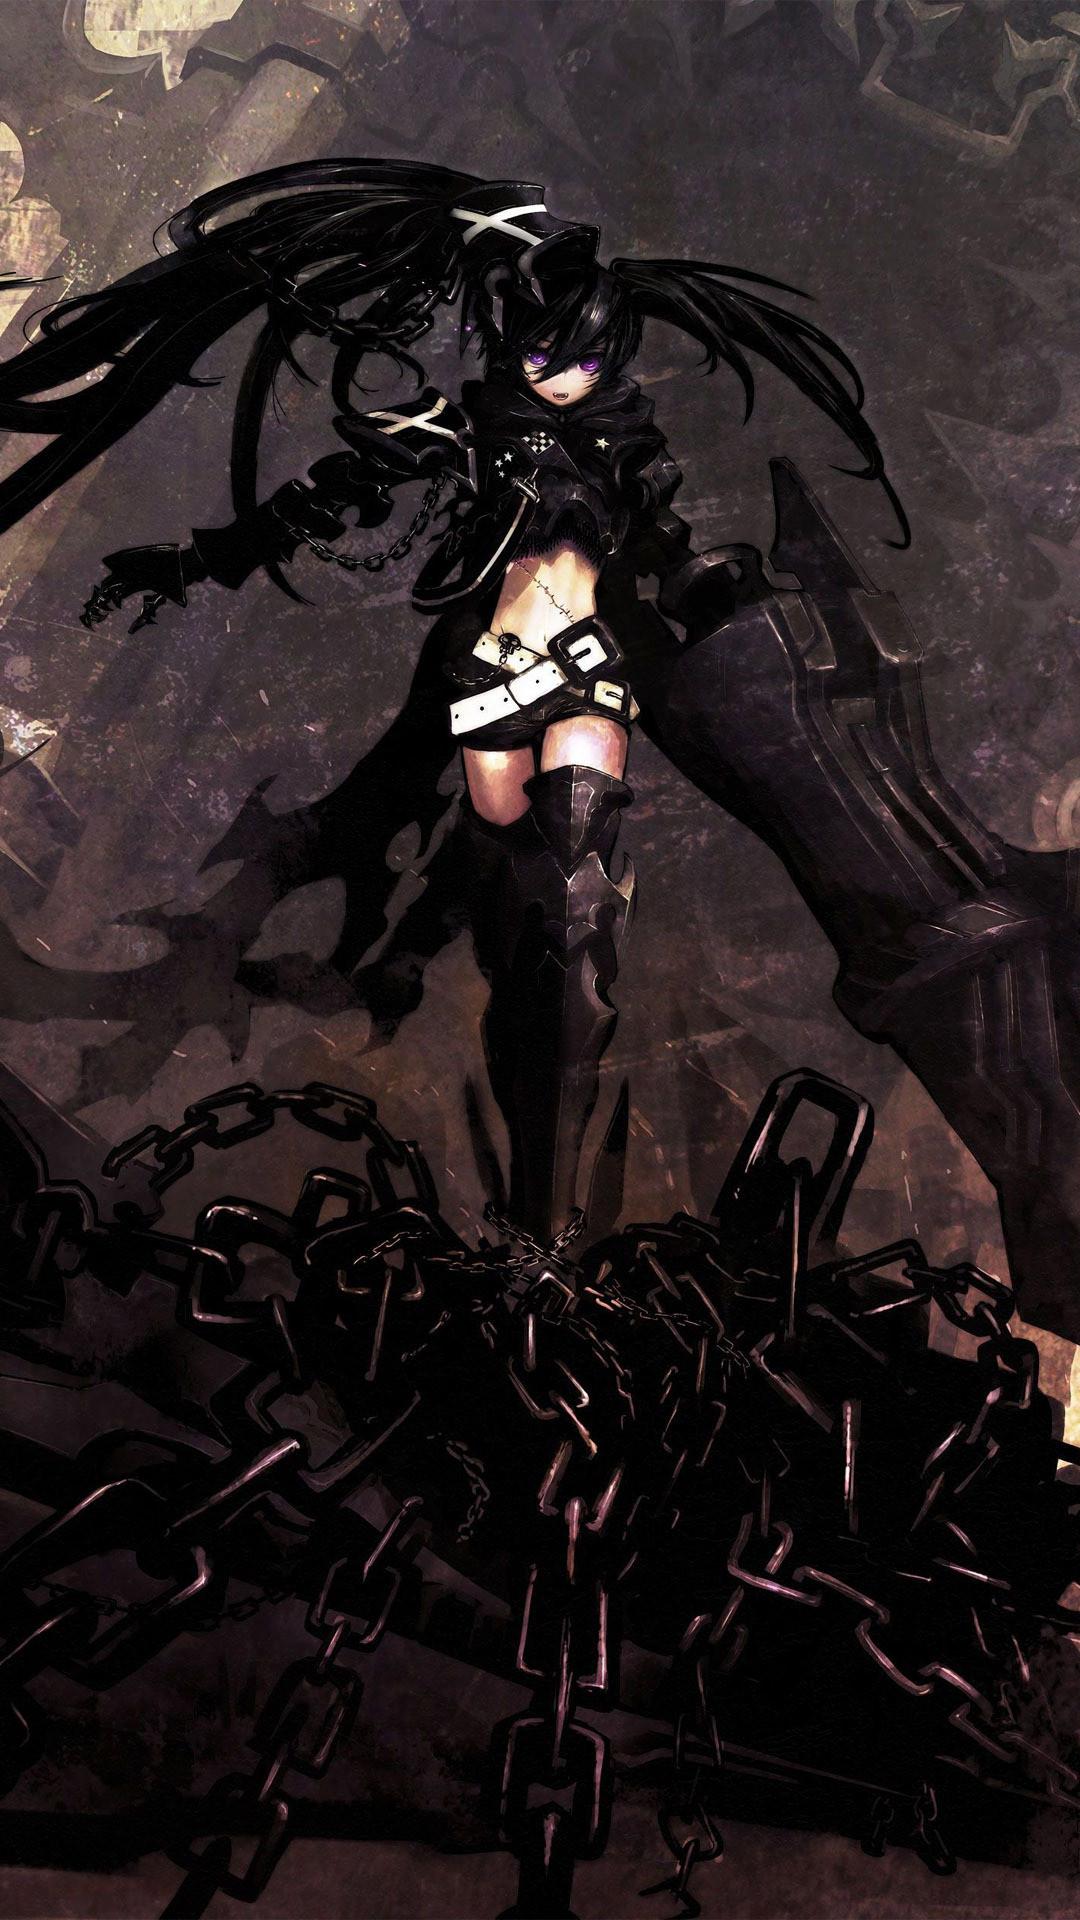 Anime • 76 downloads Black Rock Shooter · Black Rock Shooter Anime  mobile wallpaper